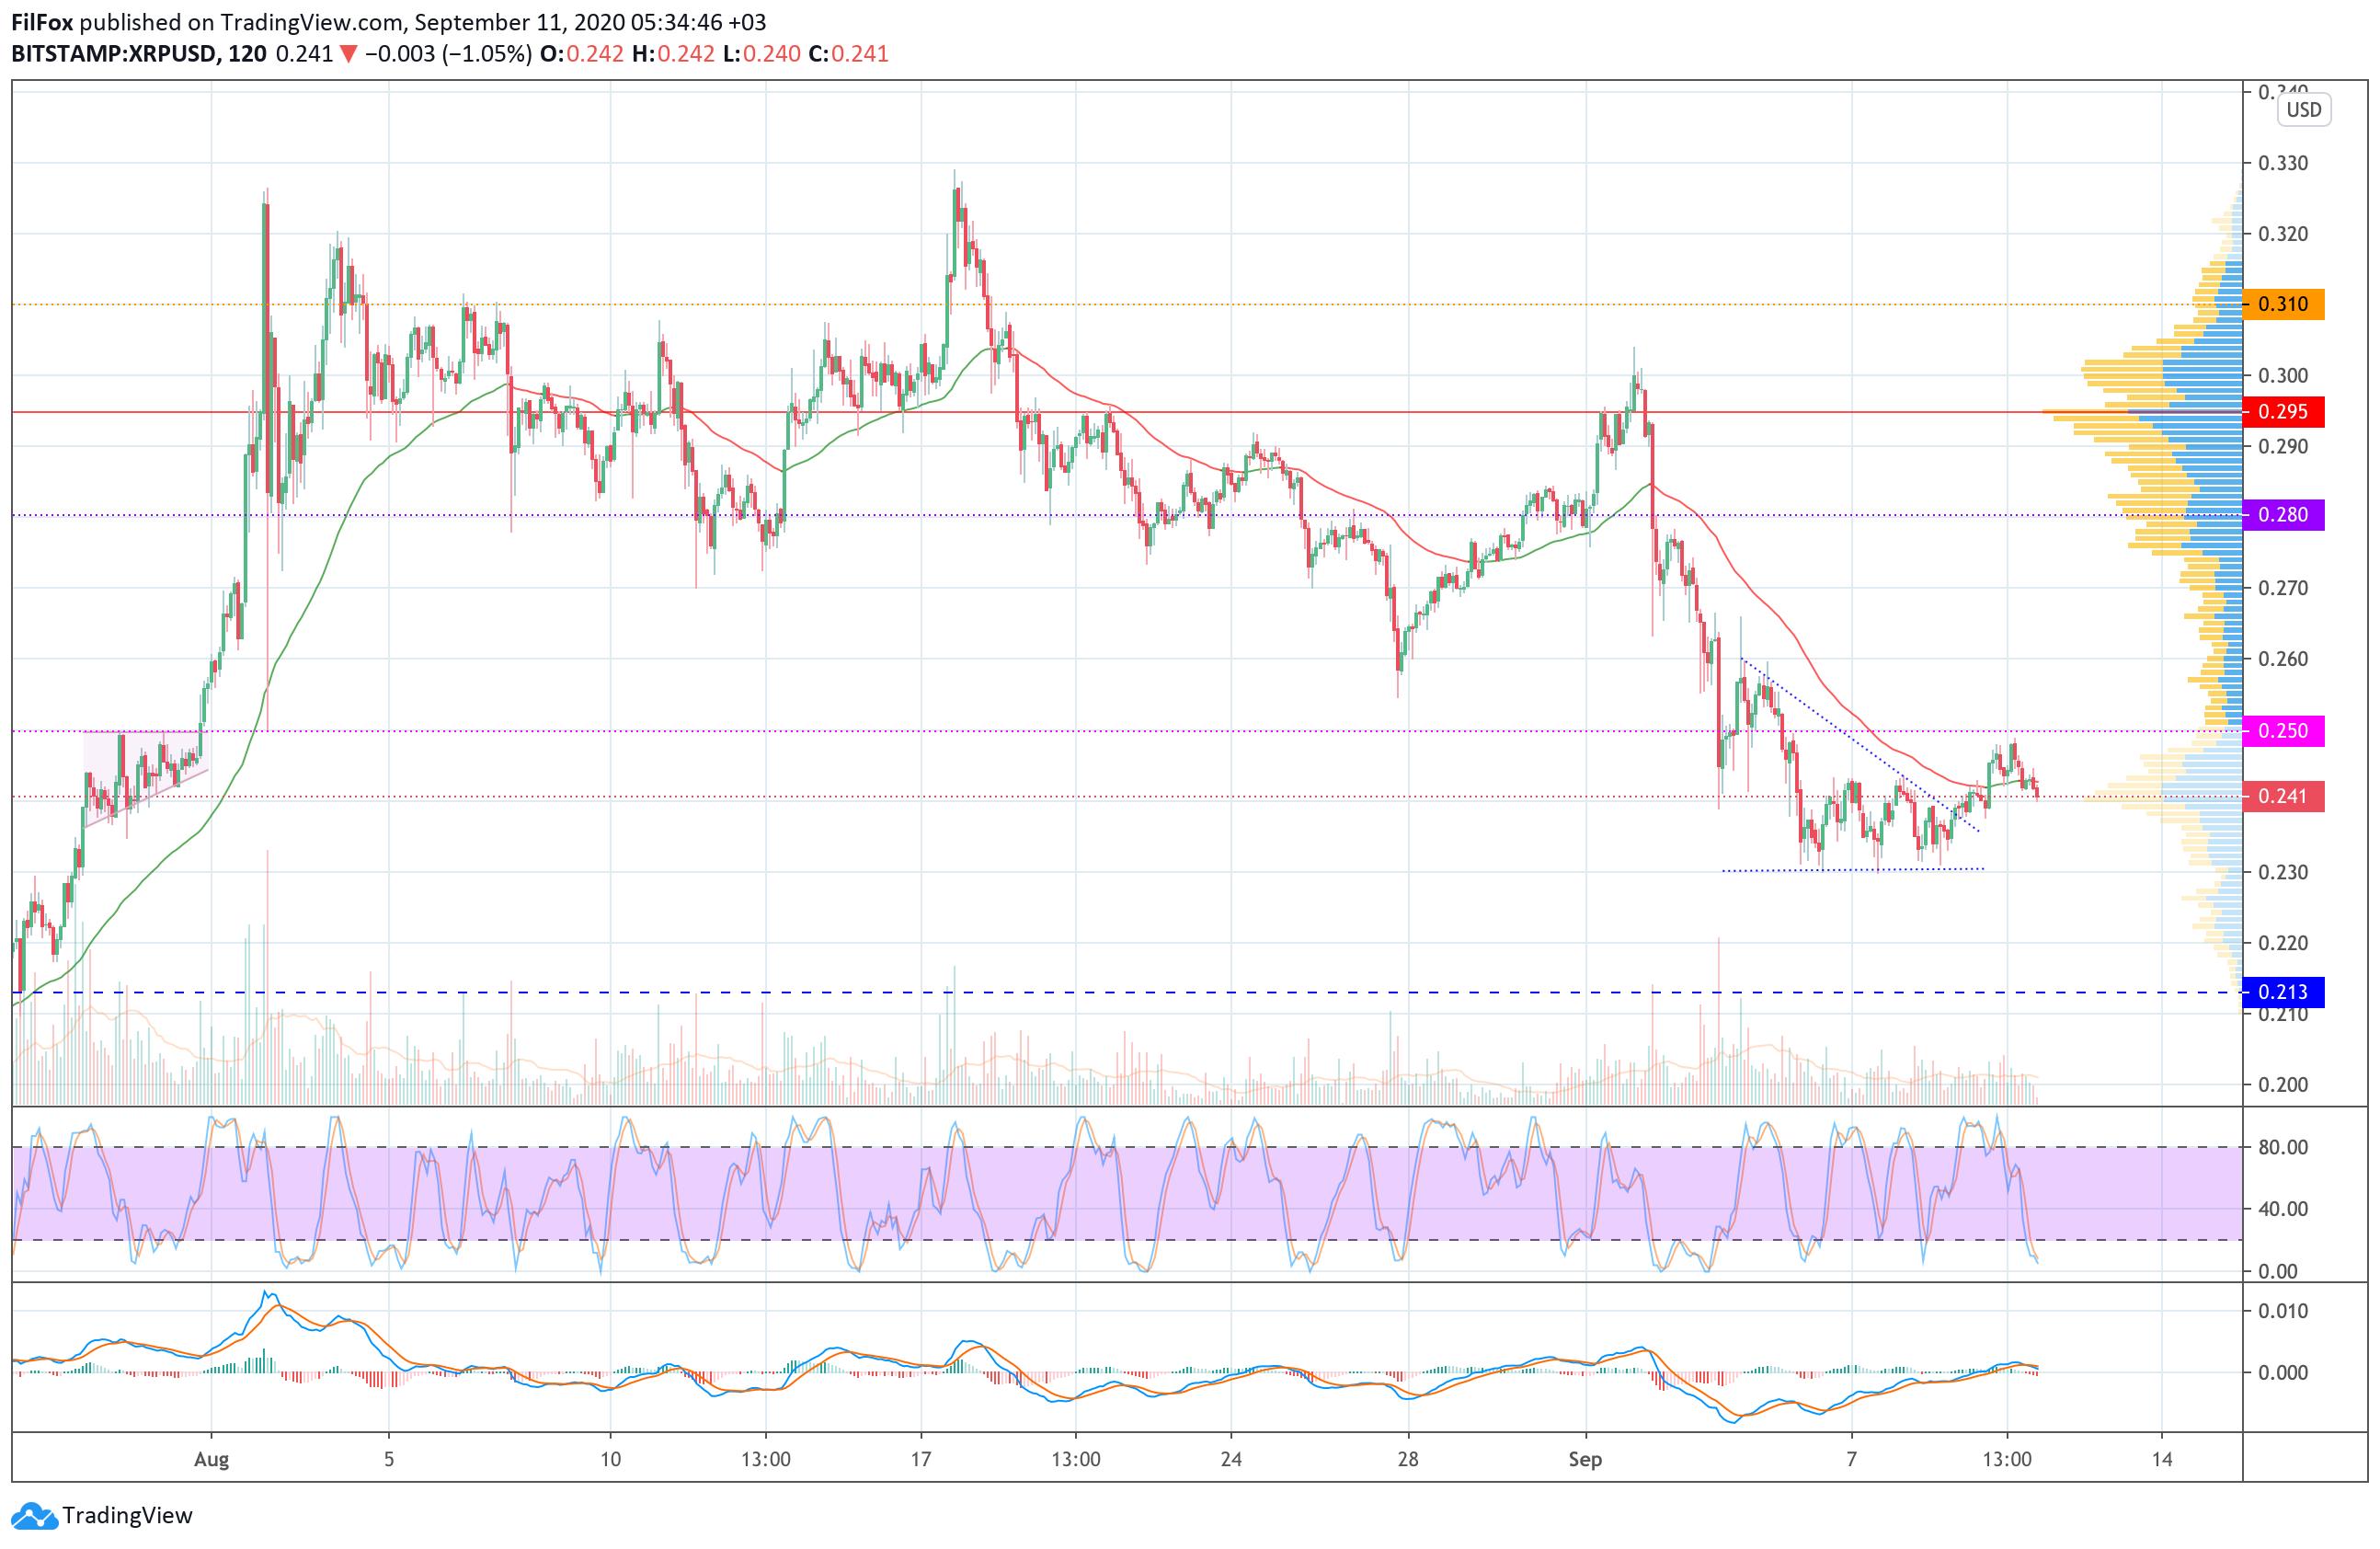 Анализ цен BTC, ETH, XRP (11.09.20)